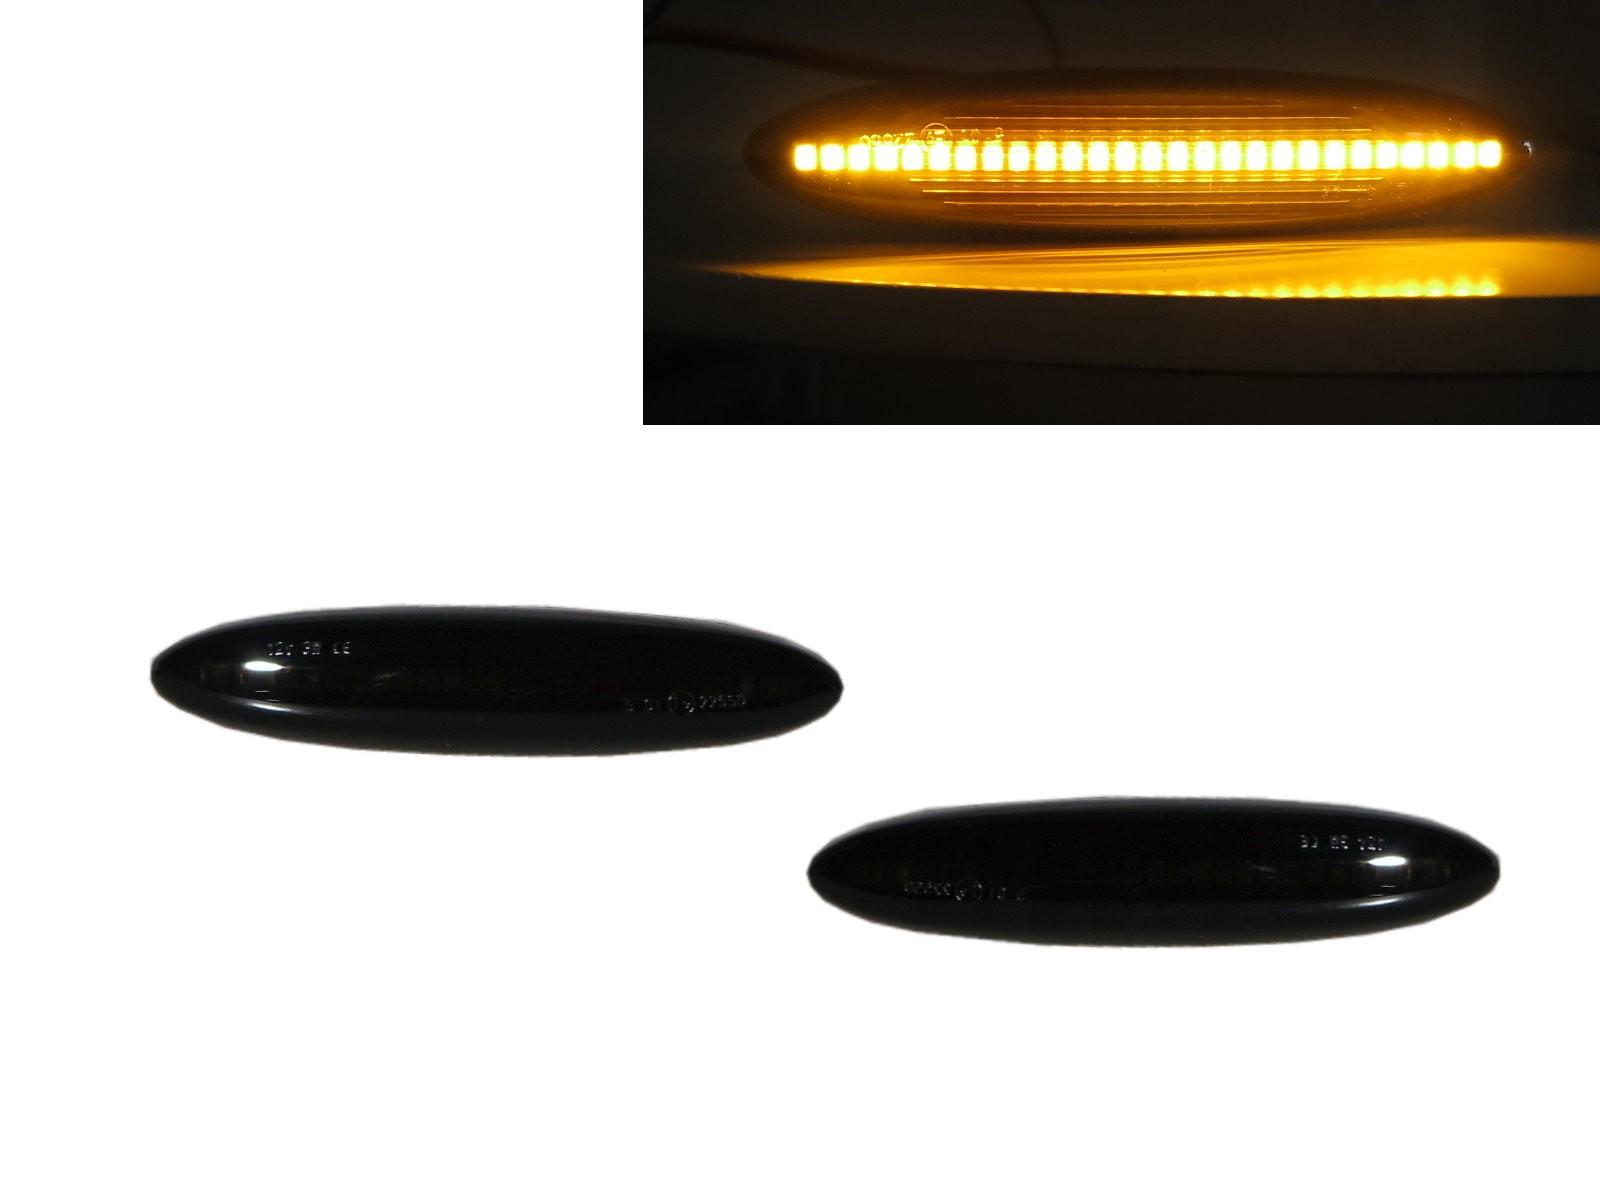 CrazyTheGod SC430 Z40 Second generation 2006-2010 Facelift Coupe/Convertible 2D LED Dynamic Turn signal Side Fender Marker Light Lamp Smoke for LEXUS